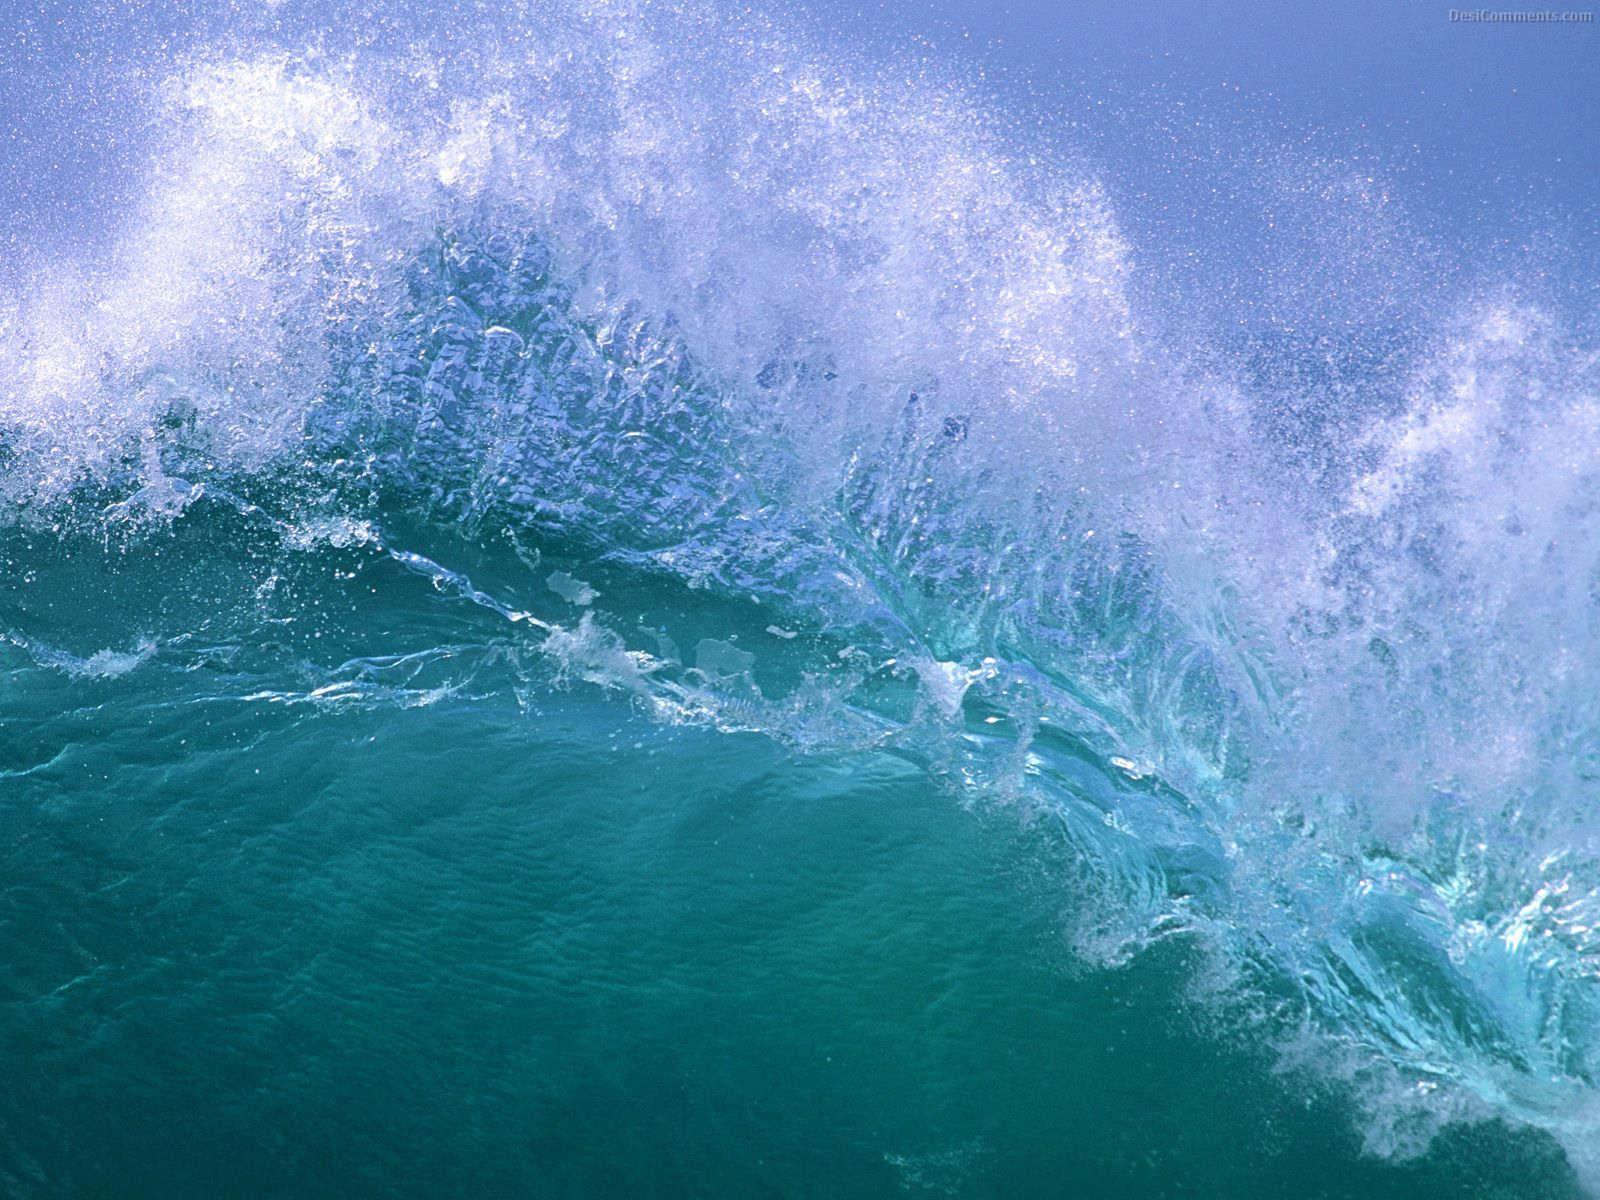 Random Ocean Waves HD Widescreen Wallpapers 1600x1200